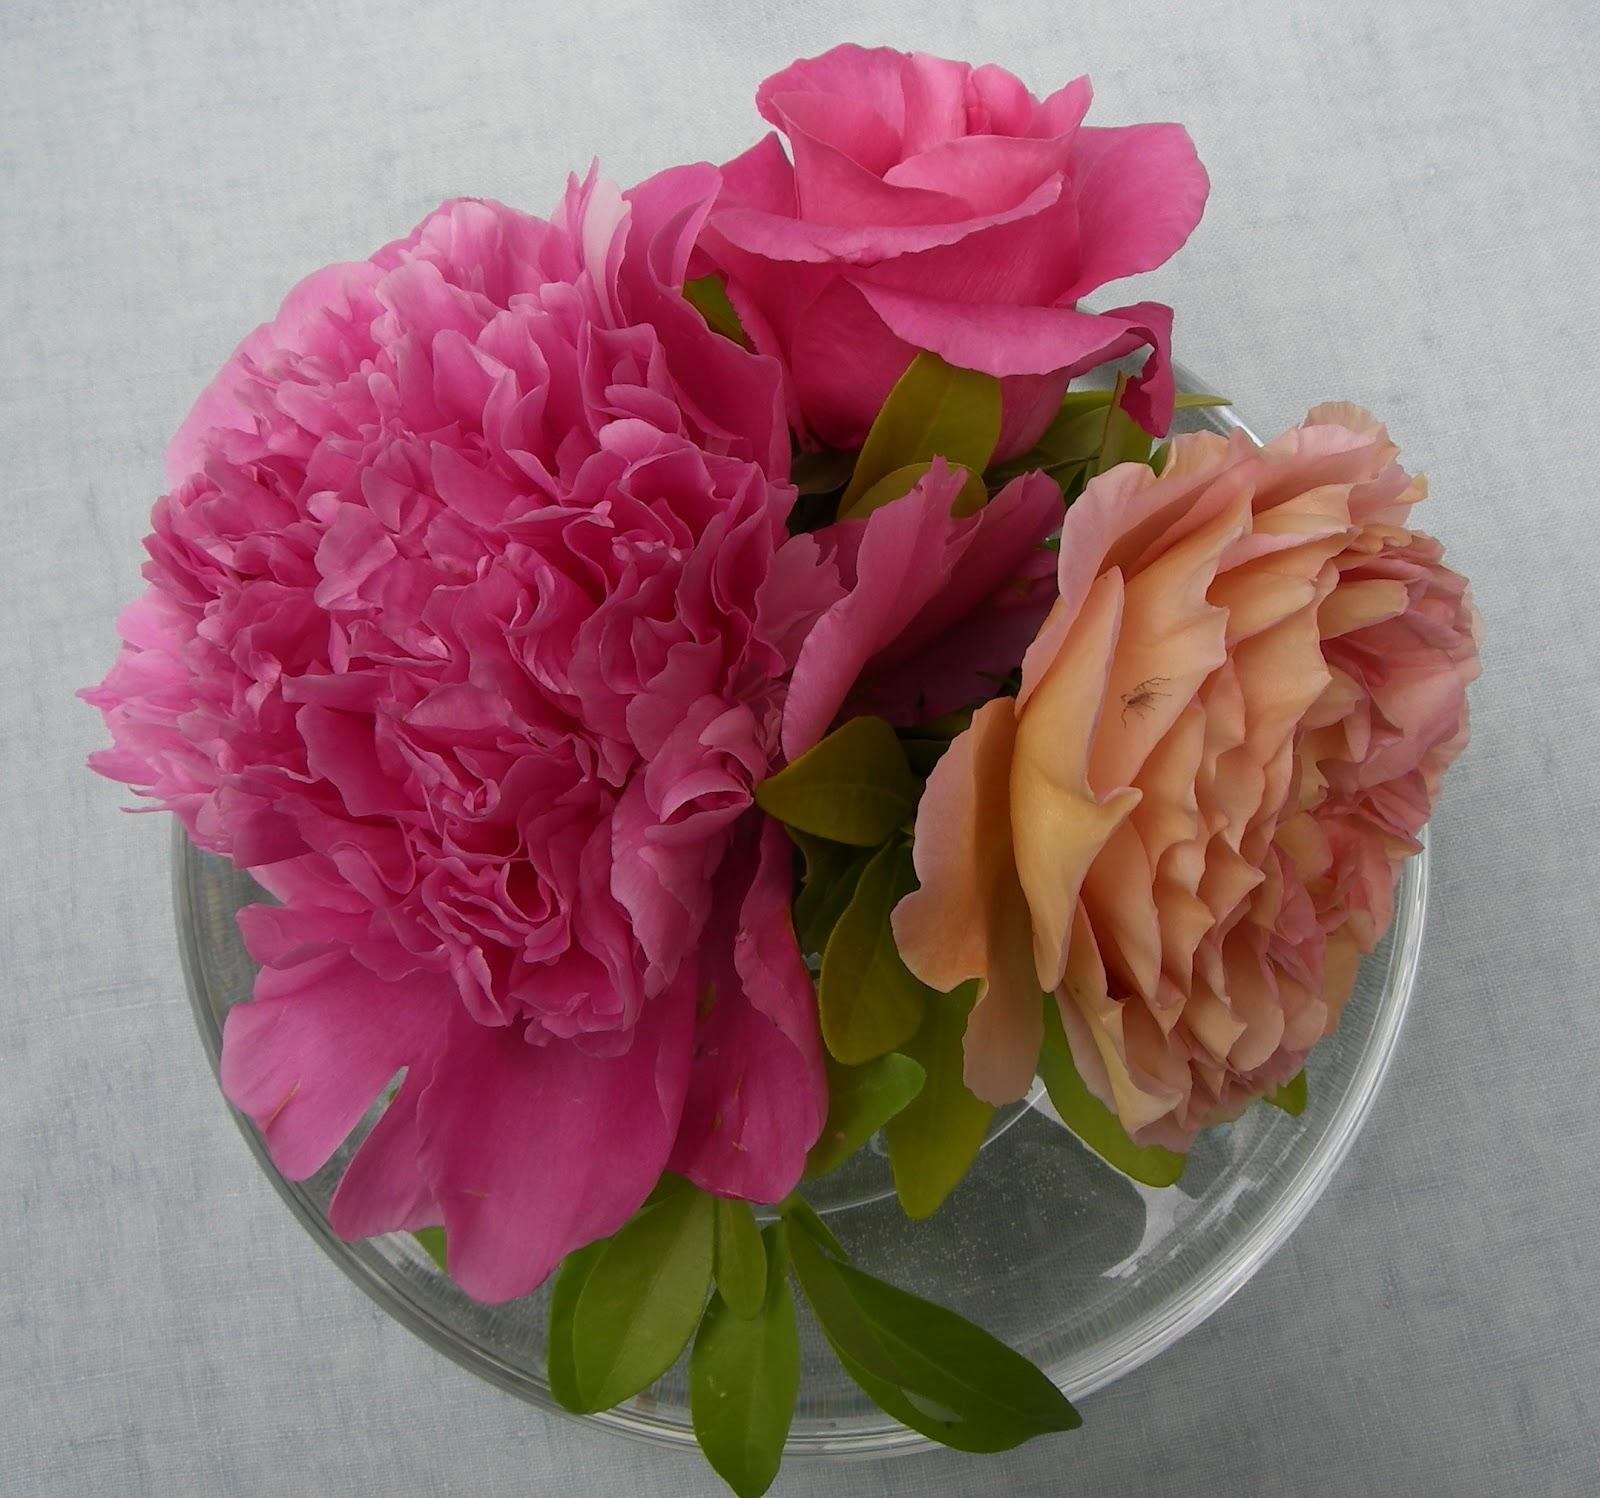 Pivoine arbustive , roses